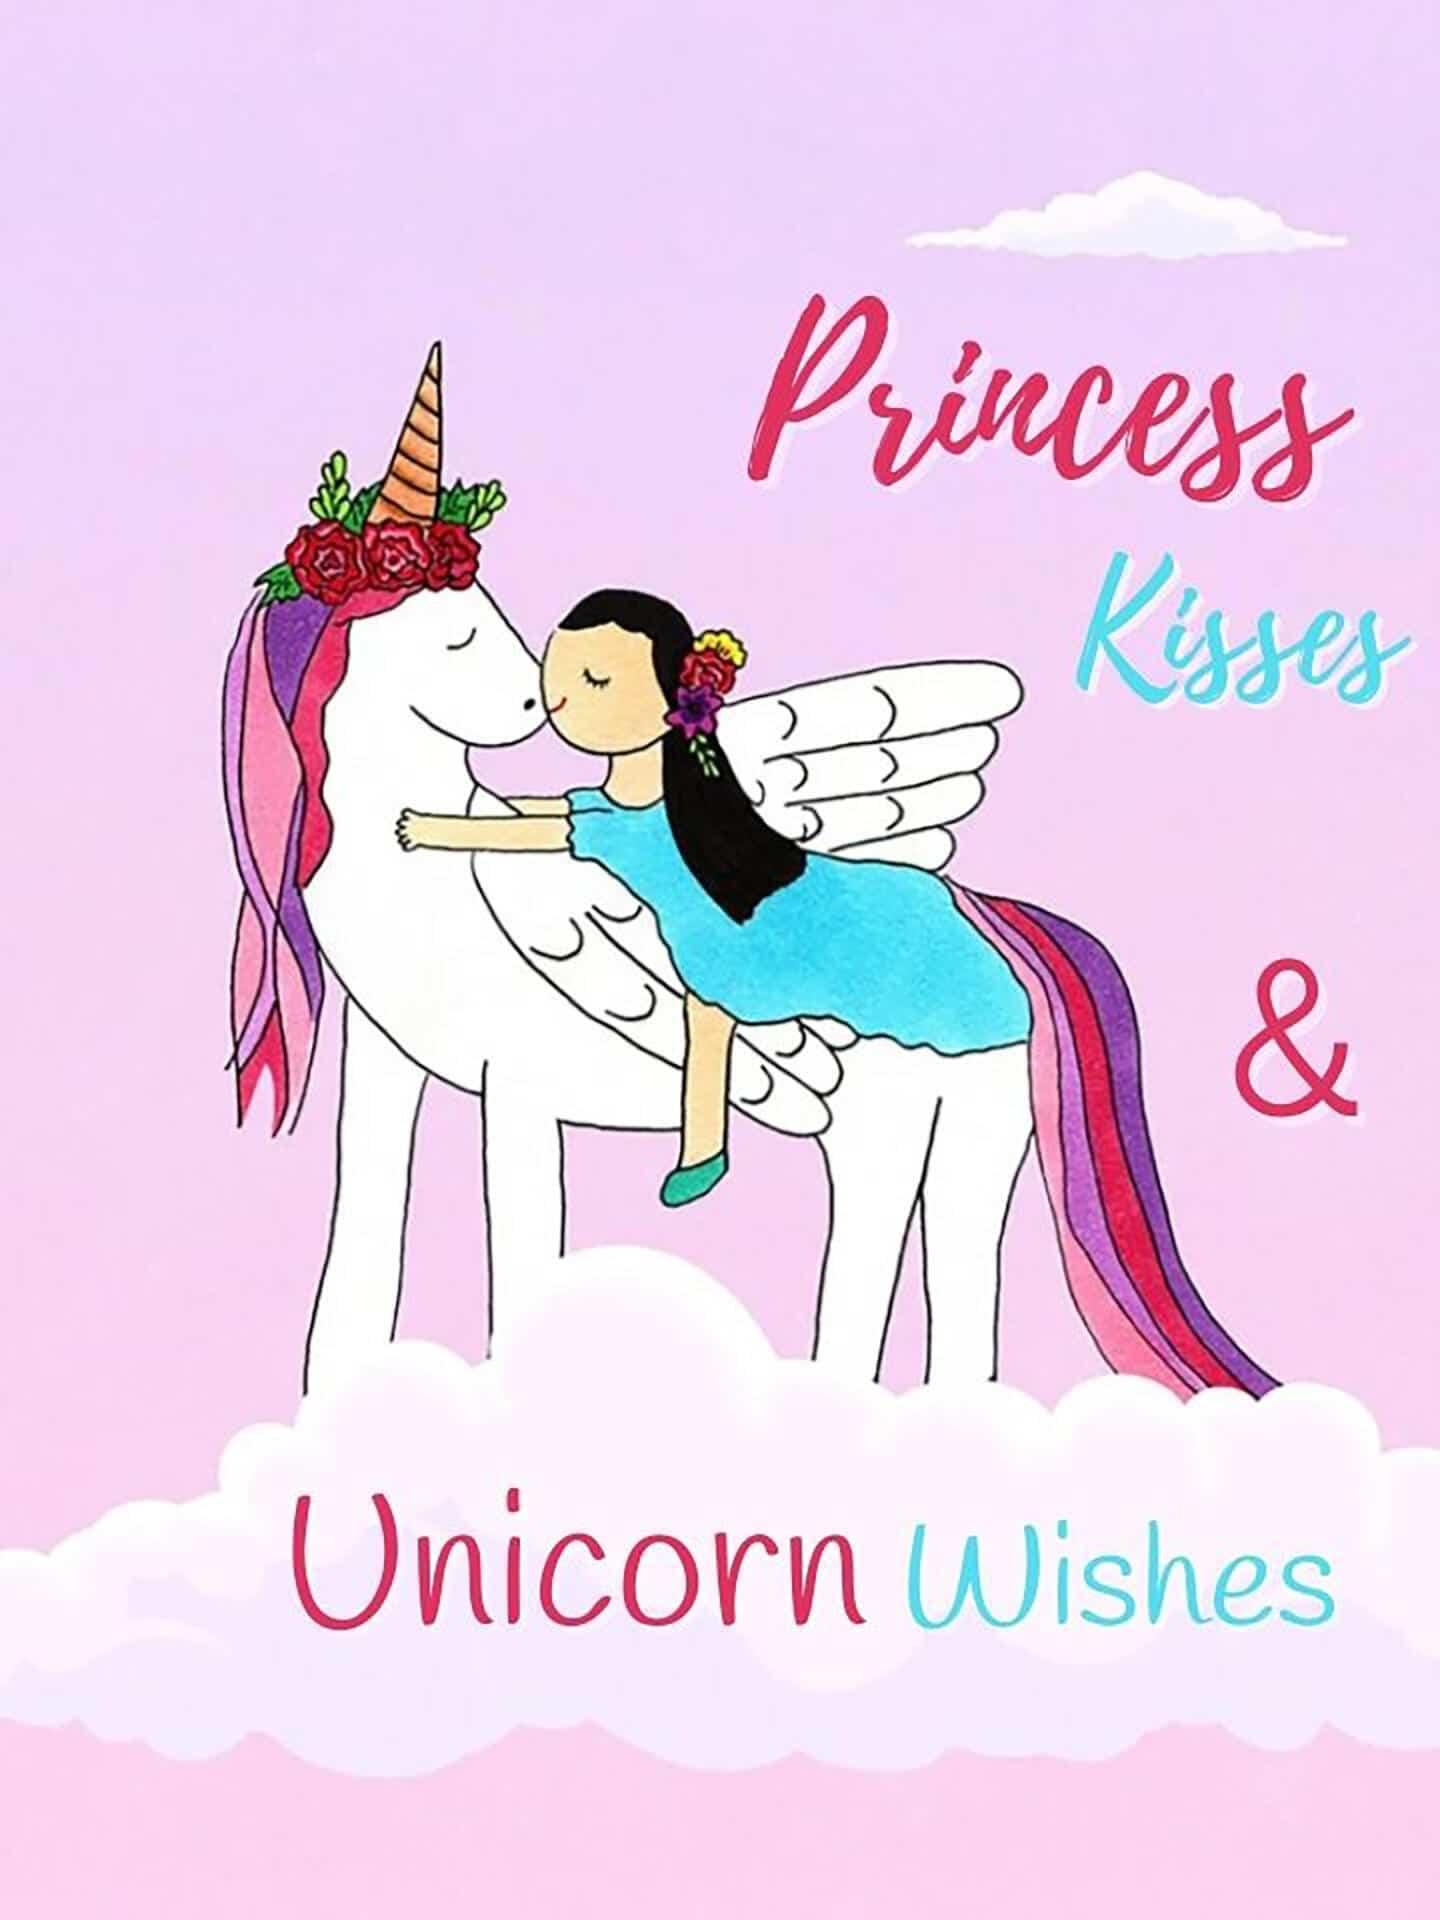 Princess Kisses & Unicorn Wishes eCard